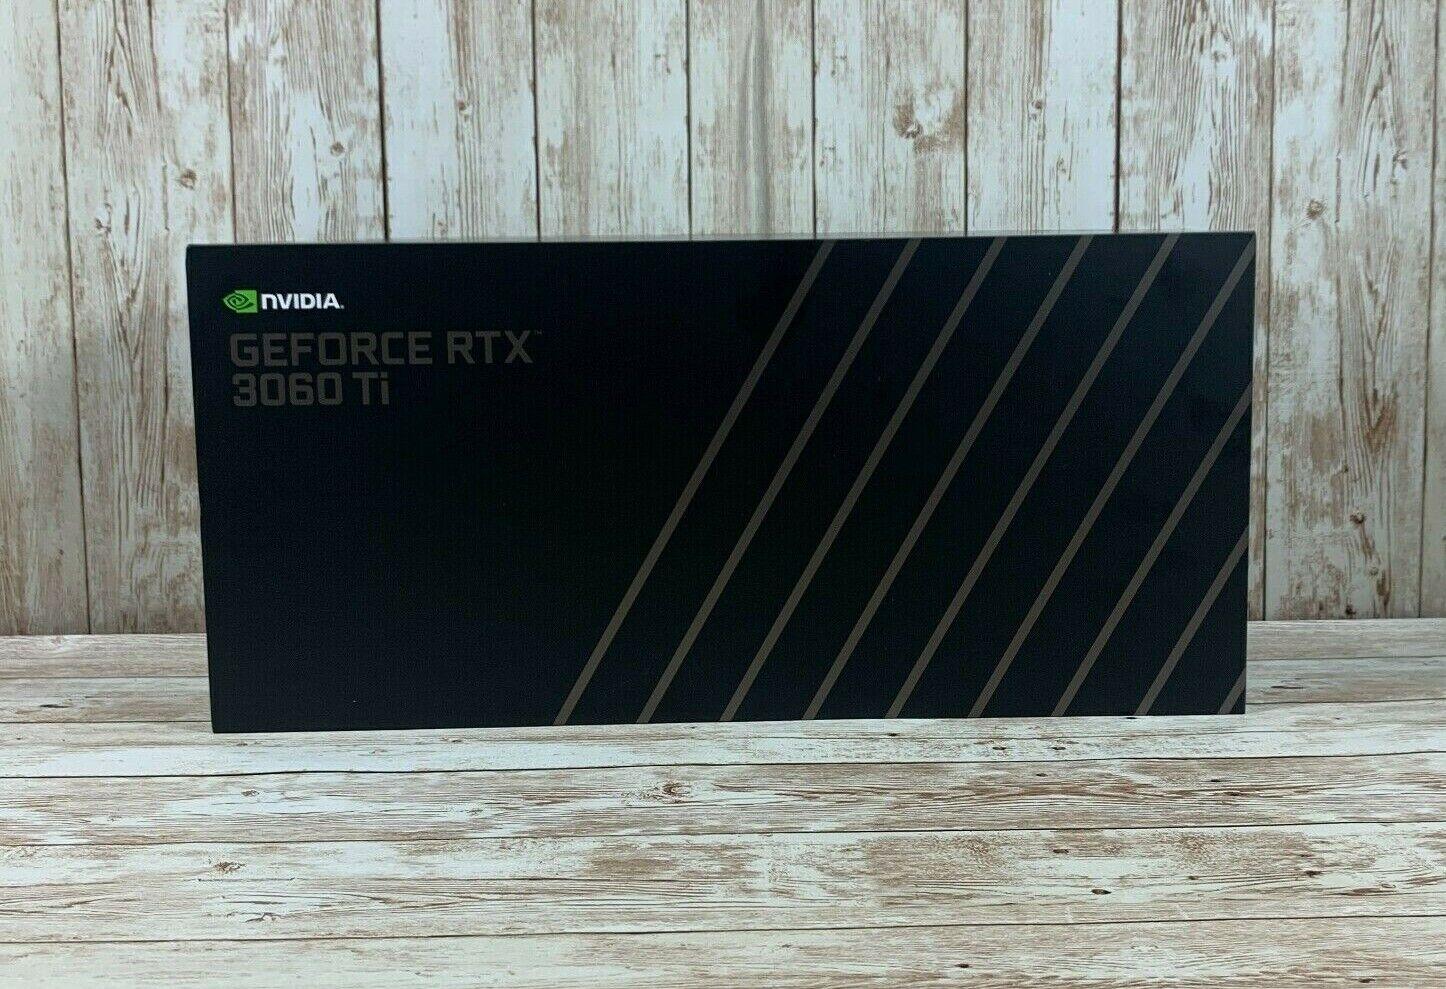 NVIDIA GeForce RTX 3060 Ti Founder's Edition FE 8GB GDDR6 Graphics Card GPU